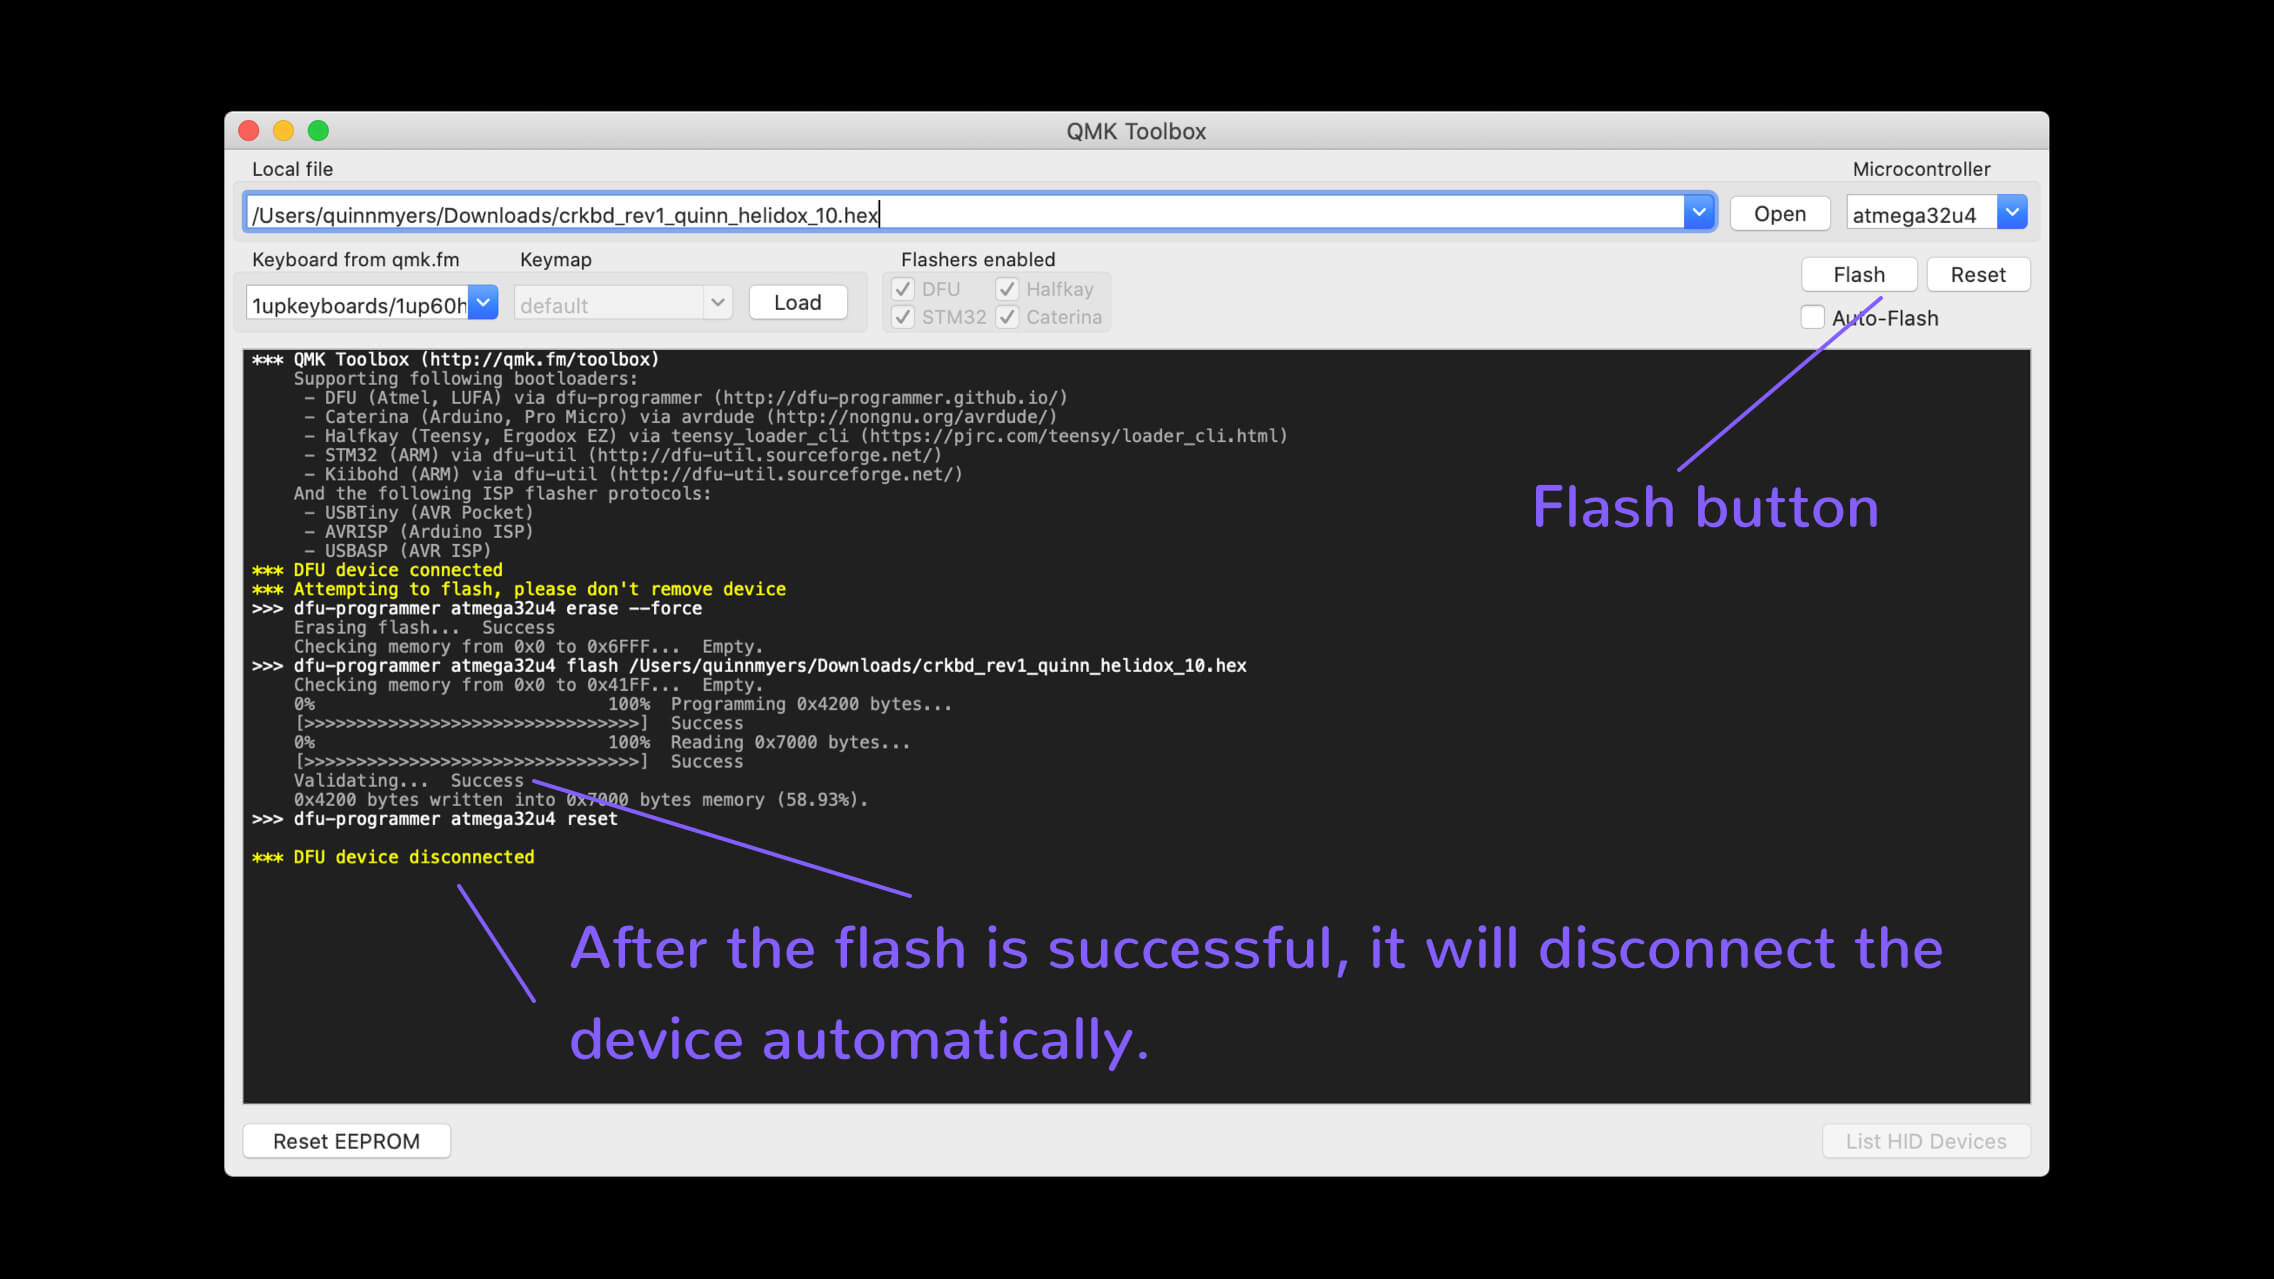 qmk toolbox successful flash message